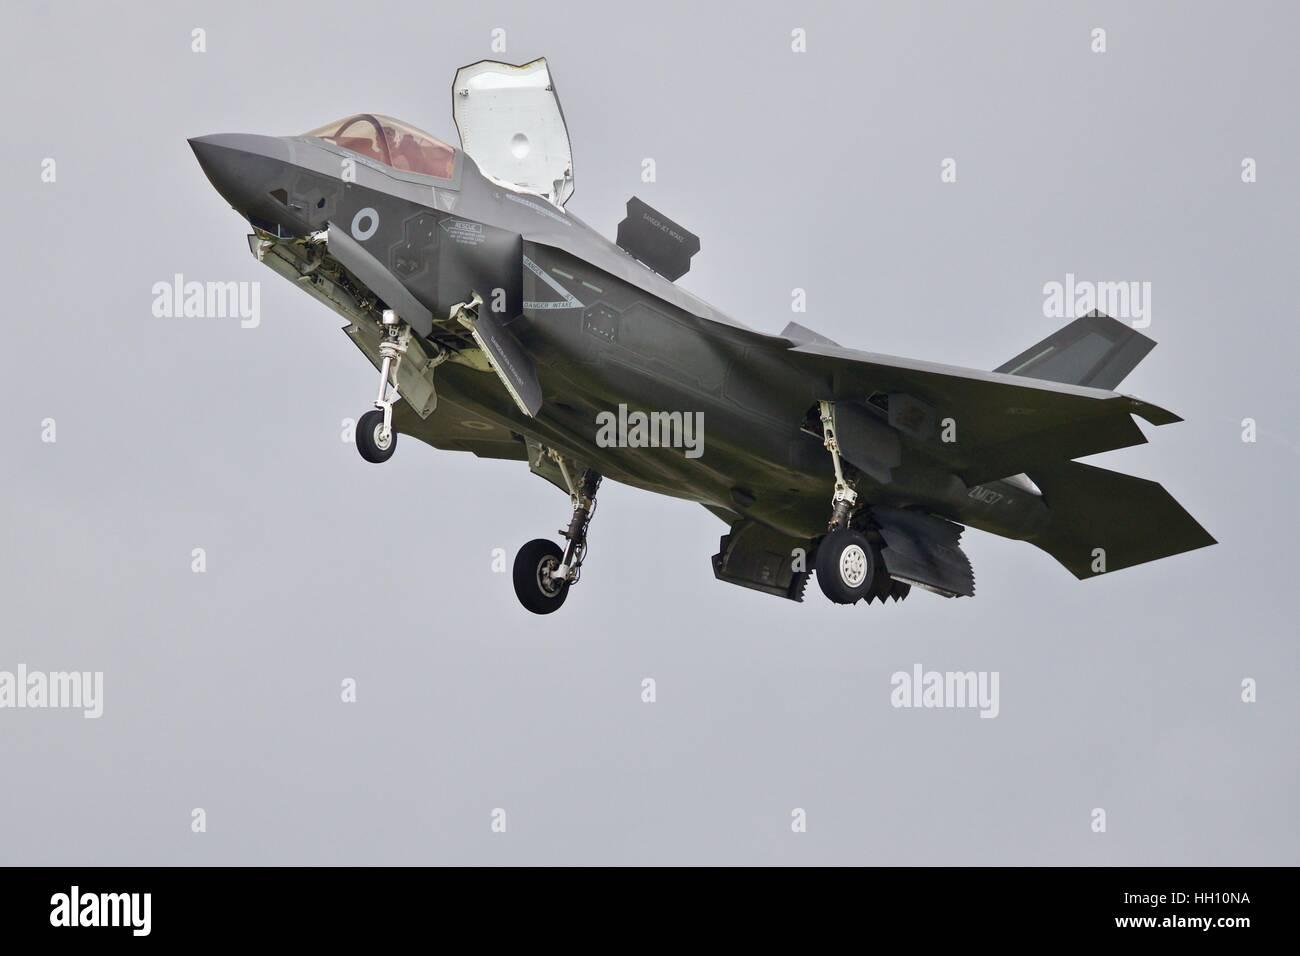 US Marine Corps F-35B Lightning ll demonstrating its hovering capabilities - Stock Image